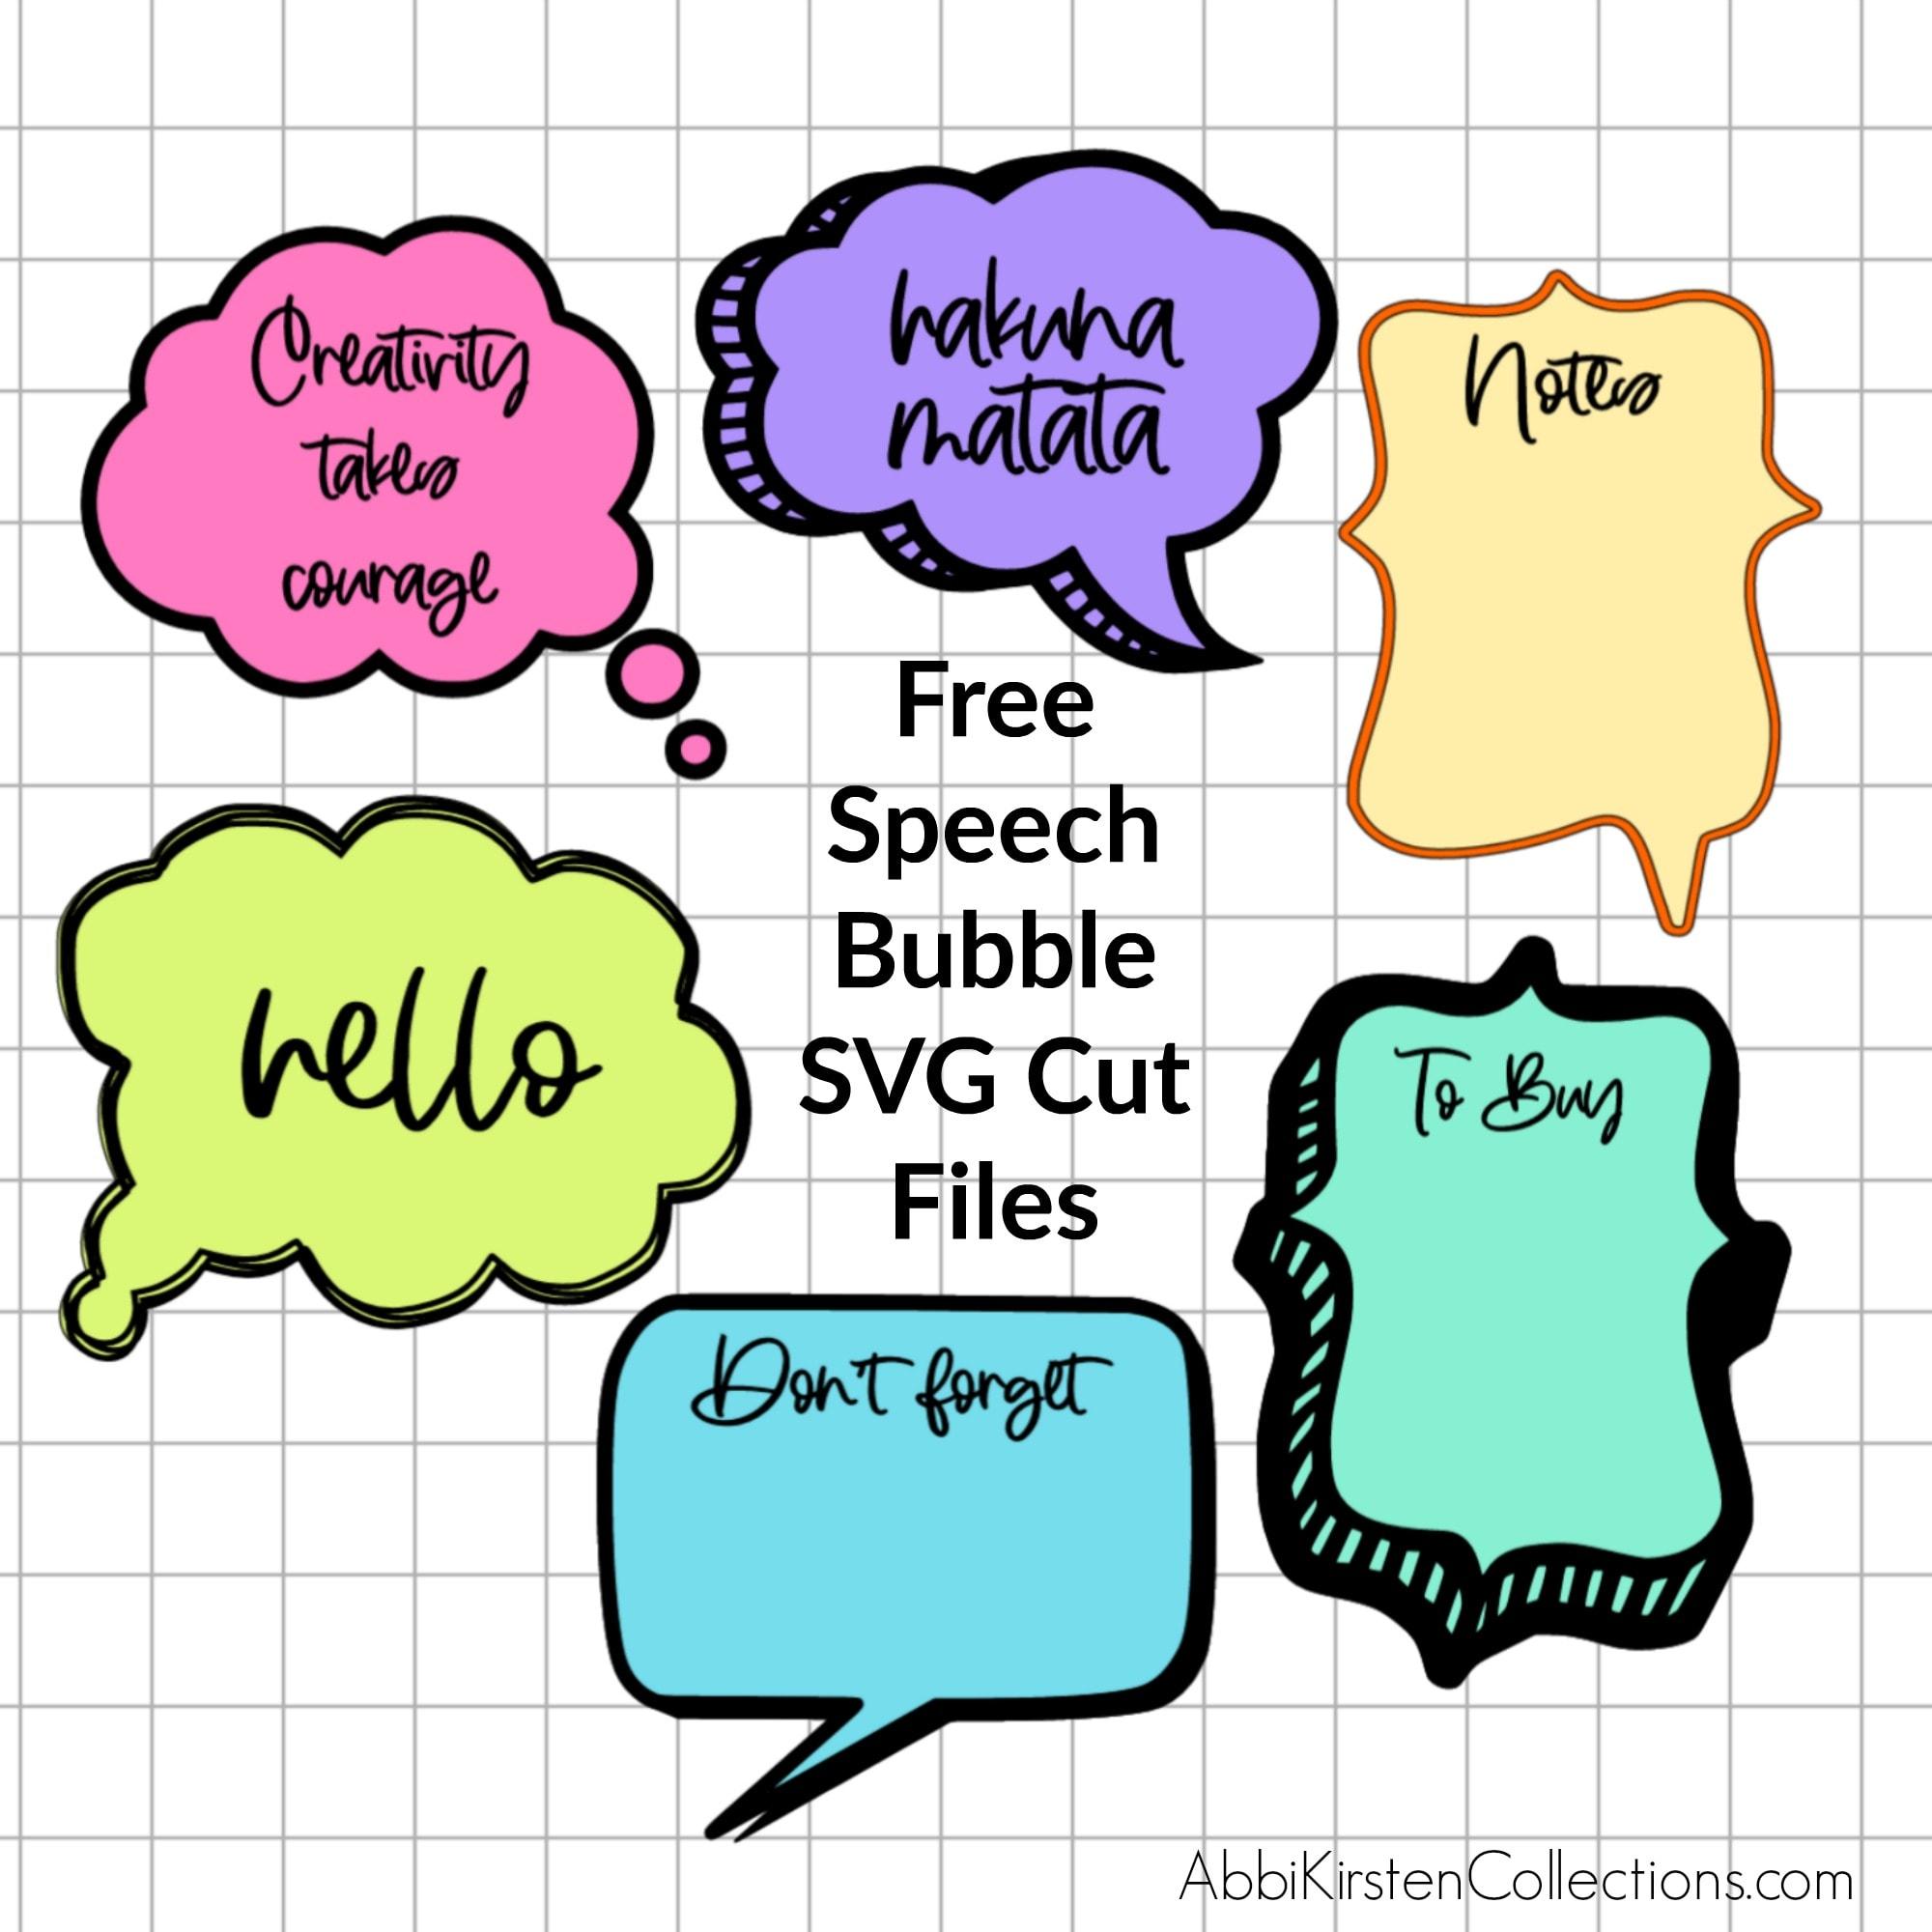 DIY Speech Bubble SVG Files for Notes with Dry Erase Cricut Vinyl